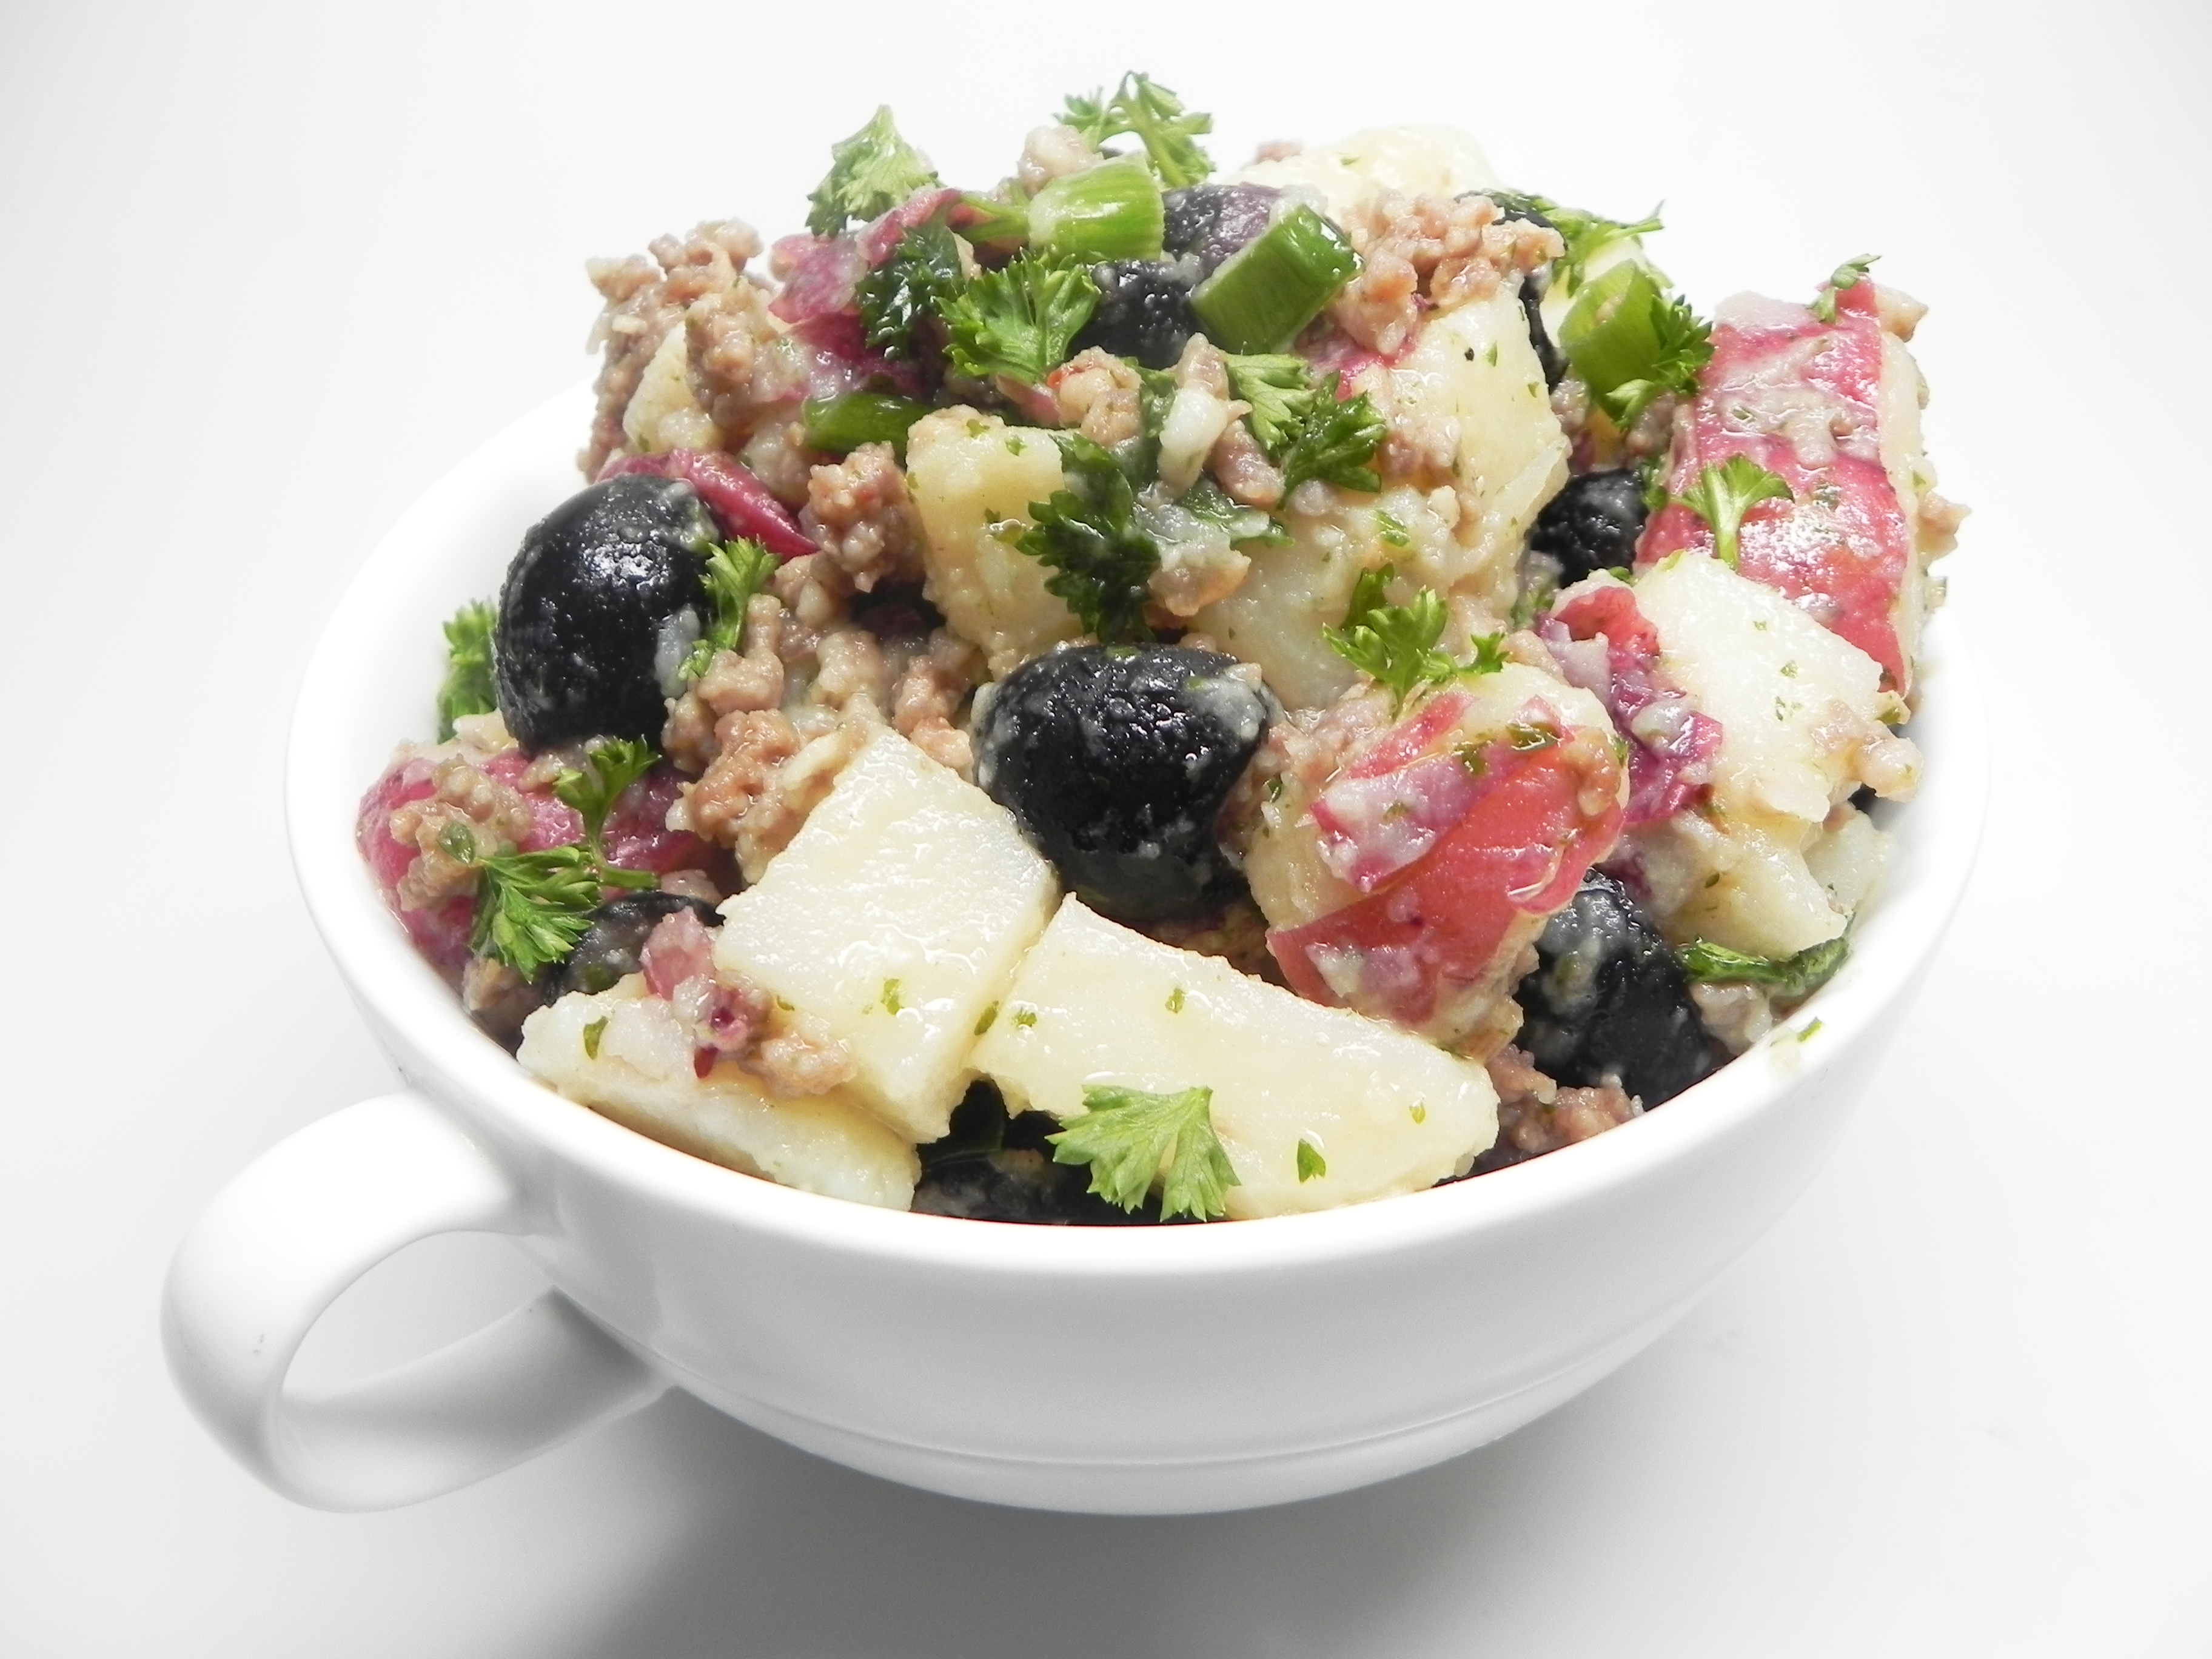 Marinated Potato Salad with Anchovy Vinaigrette